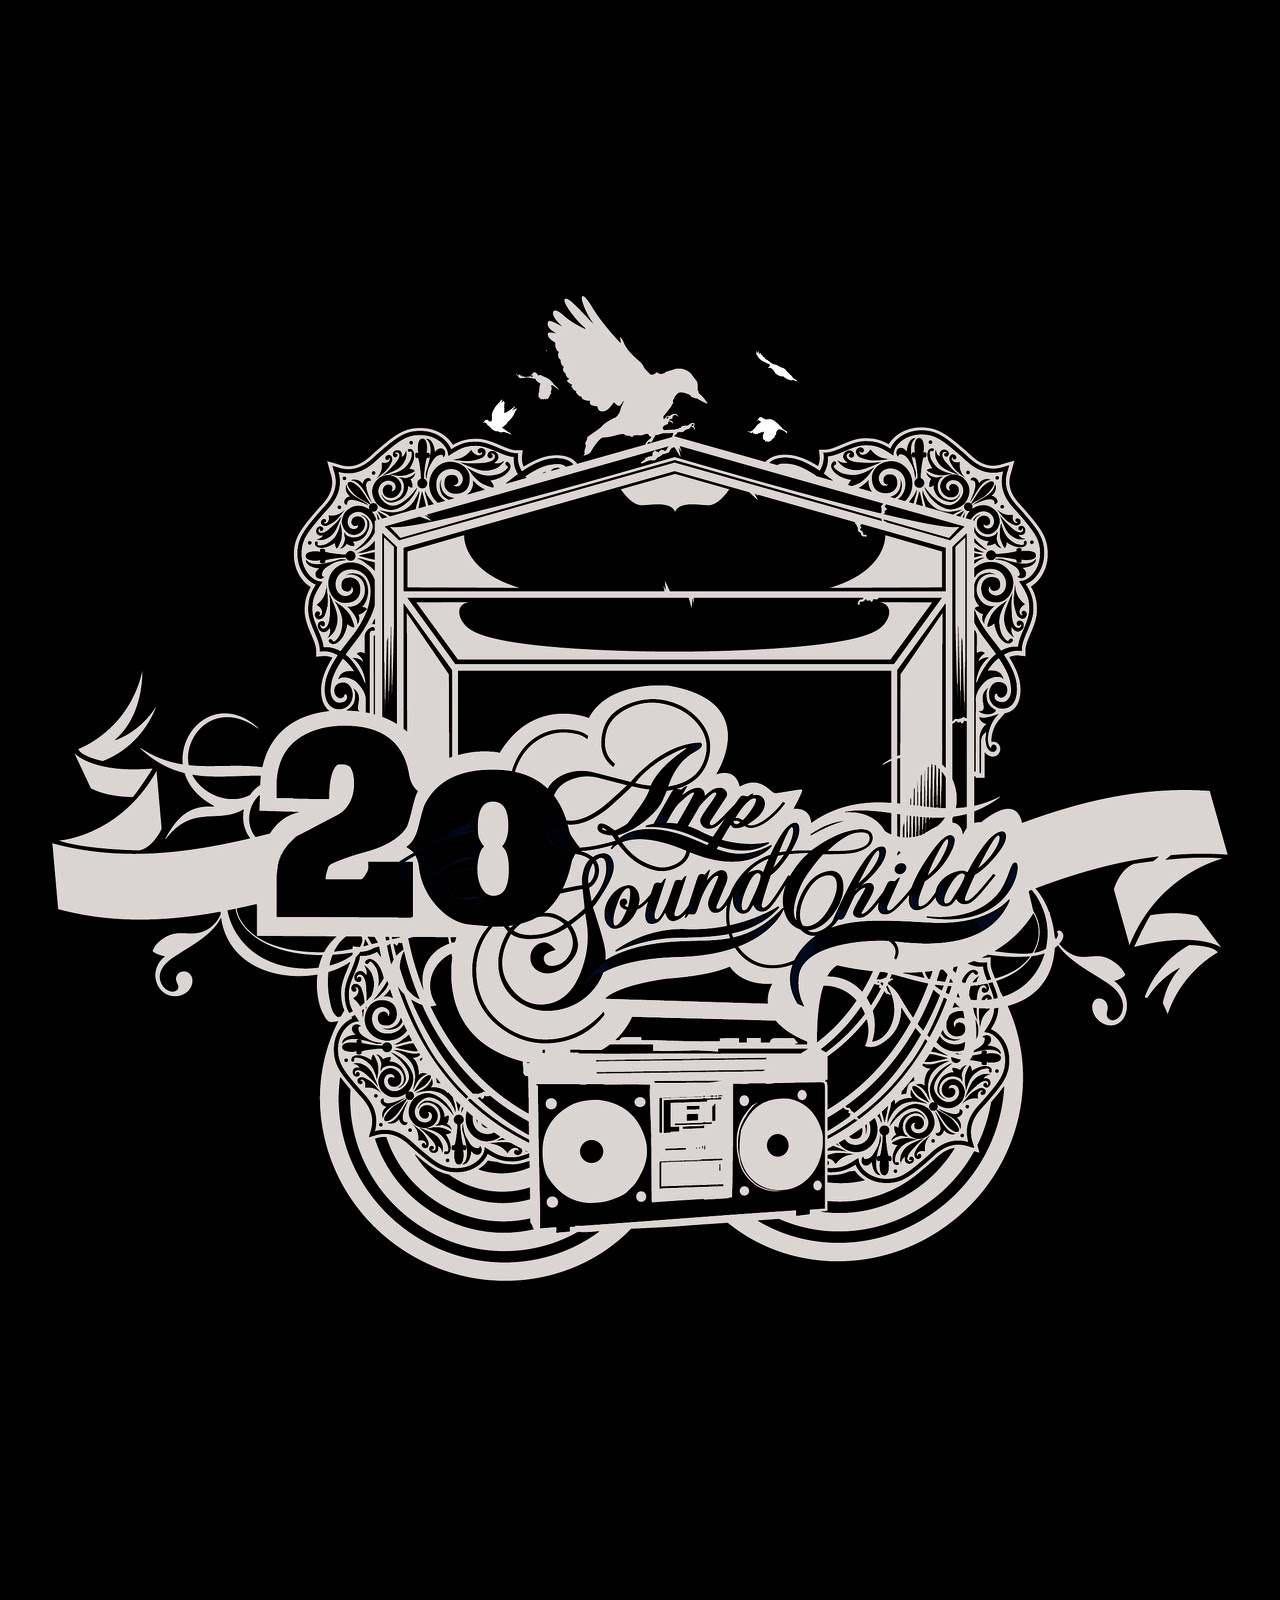 http://4.bp.blogspot.com/_TFBp8yq9lN0/TB9R3dD9uNI/AAAAAAAAJjA/E-5i4aZymQA/s1600/20ampsoundchild_logo.jpg